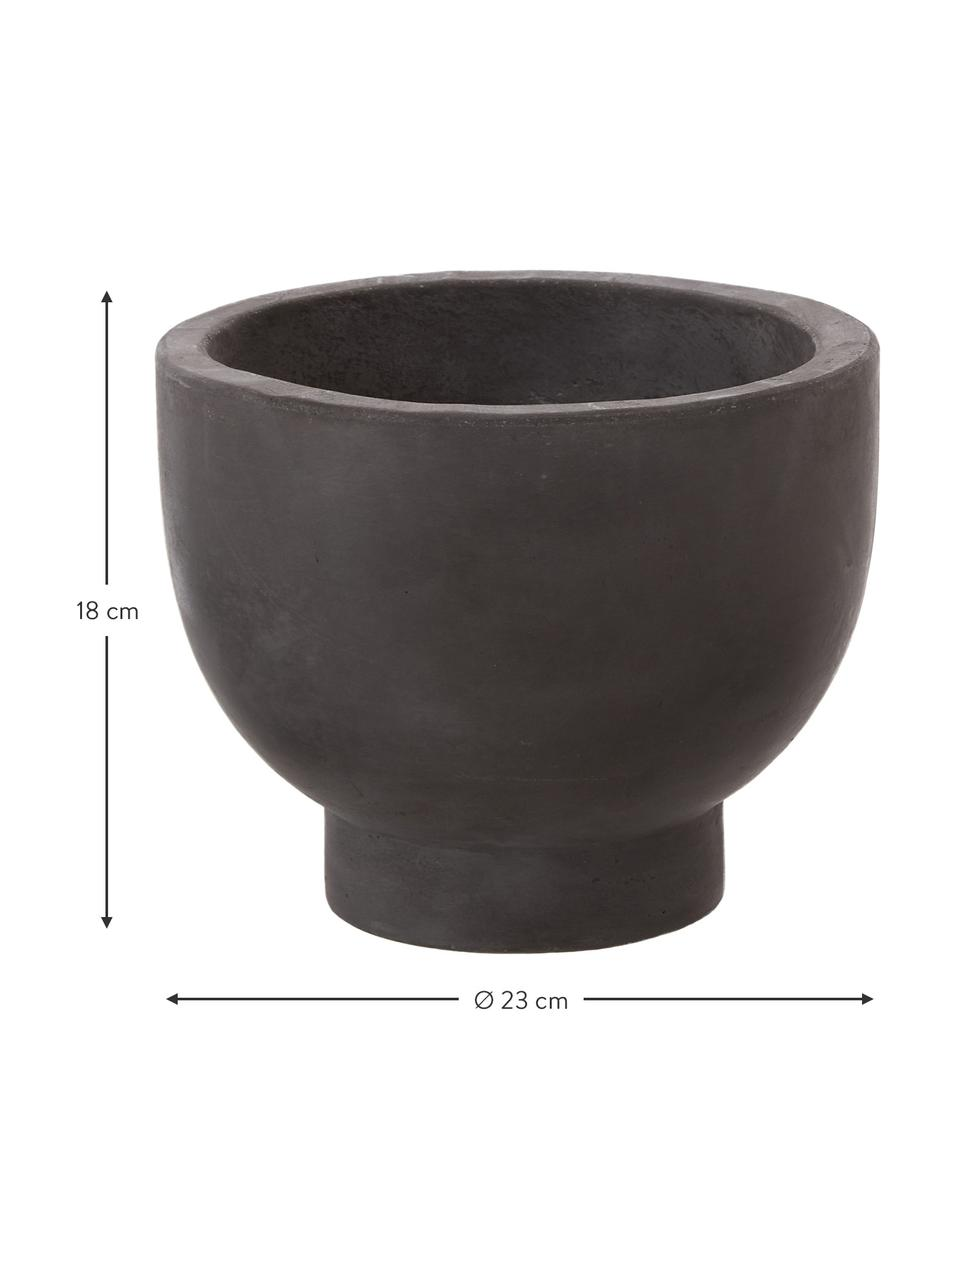 Großer Pflanztopf Rom aus Zement, Zement, bemalt, Schwarz, Ø 23 x H 18 cm